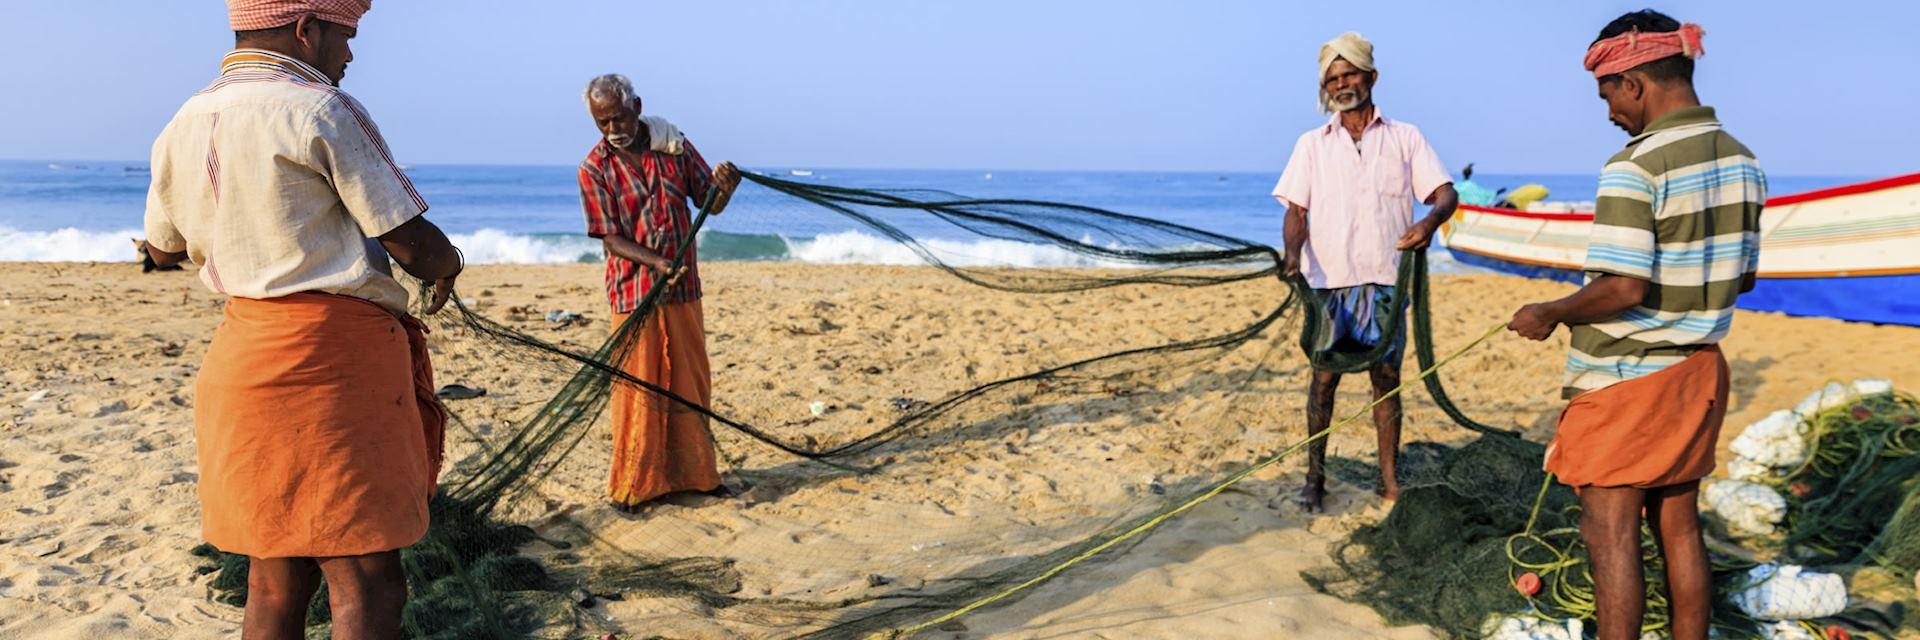 Fishermen on a Kerala beach